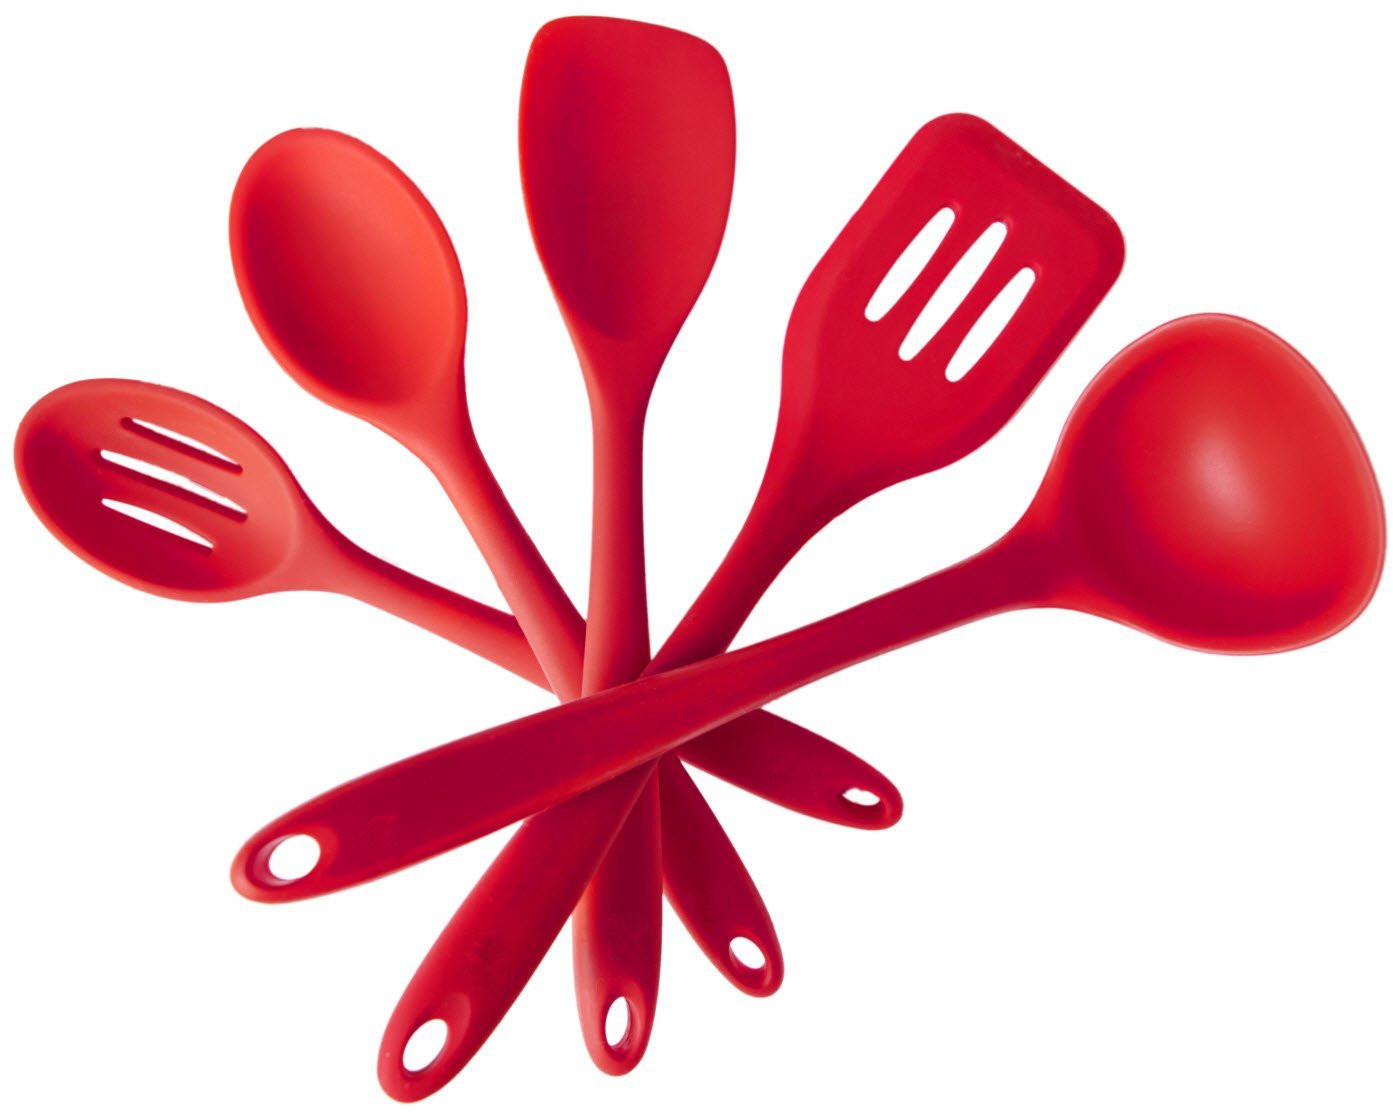 5PCS Set FDA Aproved Silicone Cooking Tools Kitchen Utensils Set